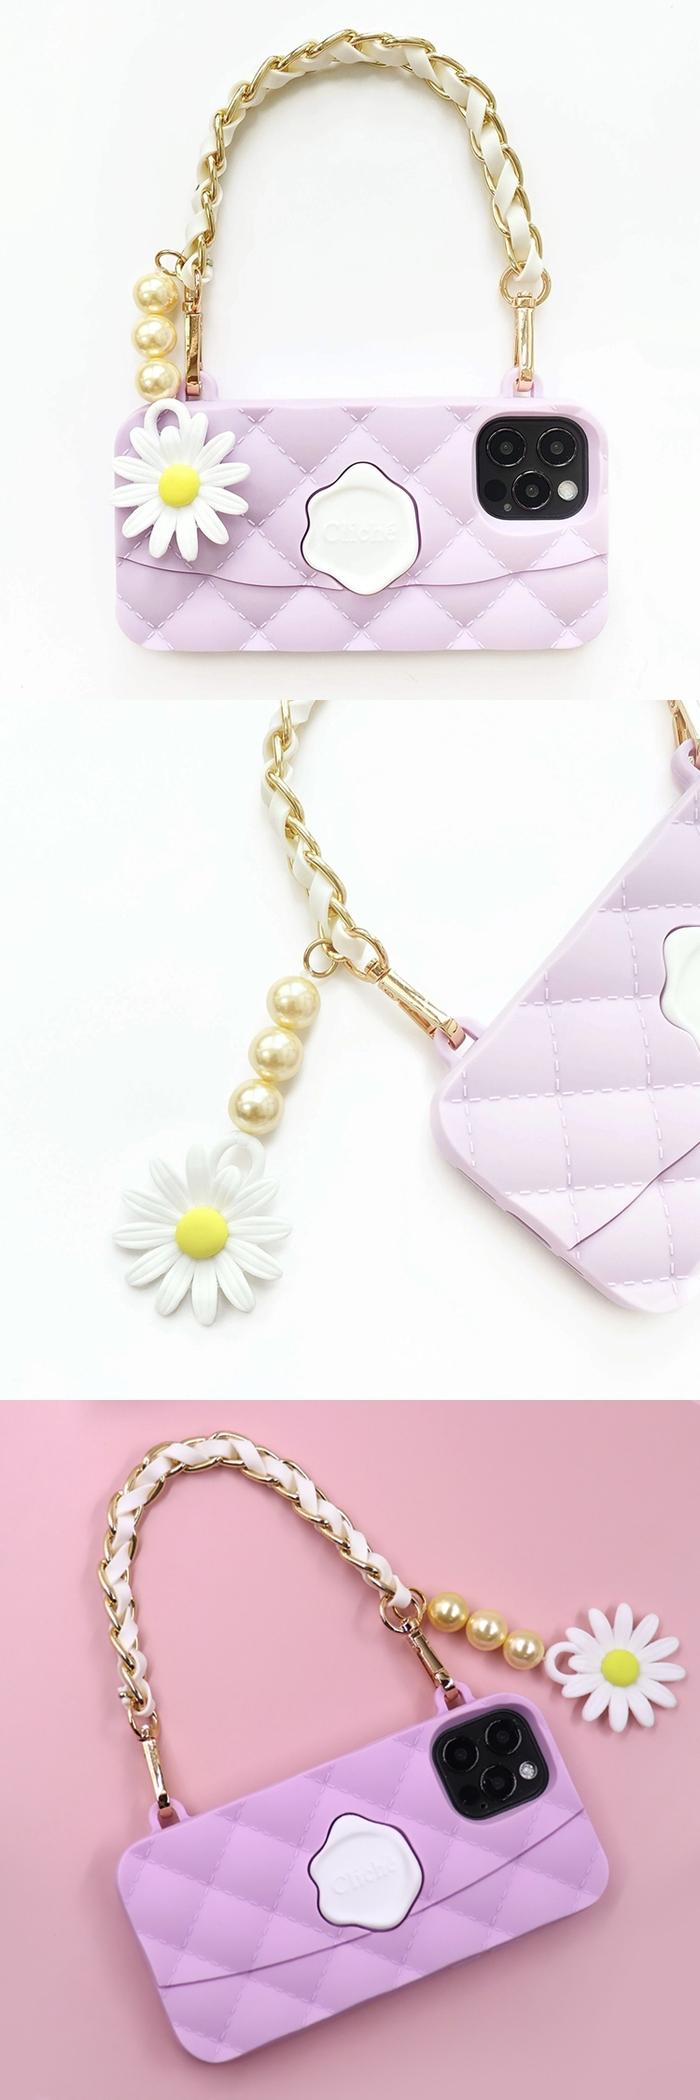 Candies|Cliche雛菊珍珠晚宴包(紫) - iPhone 12 Pro